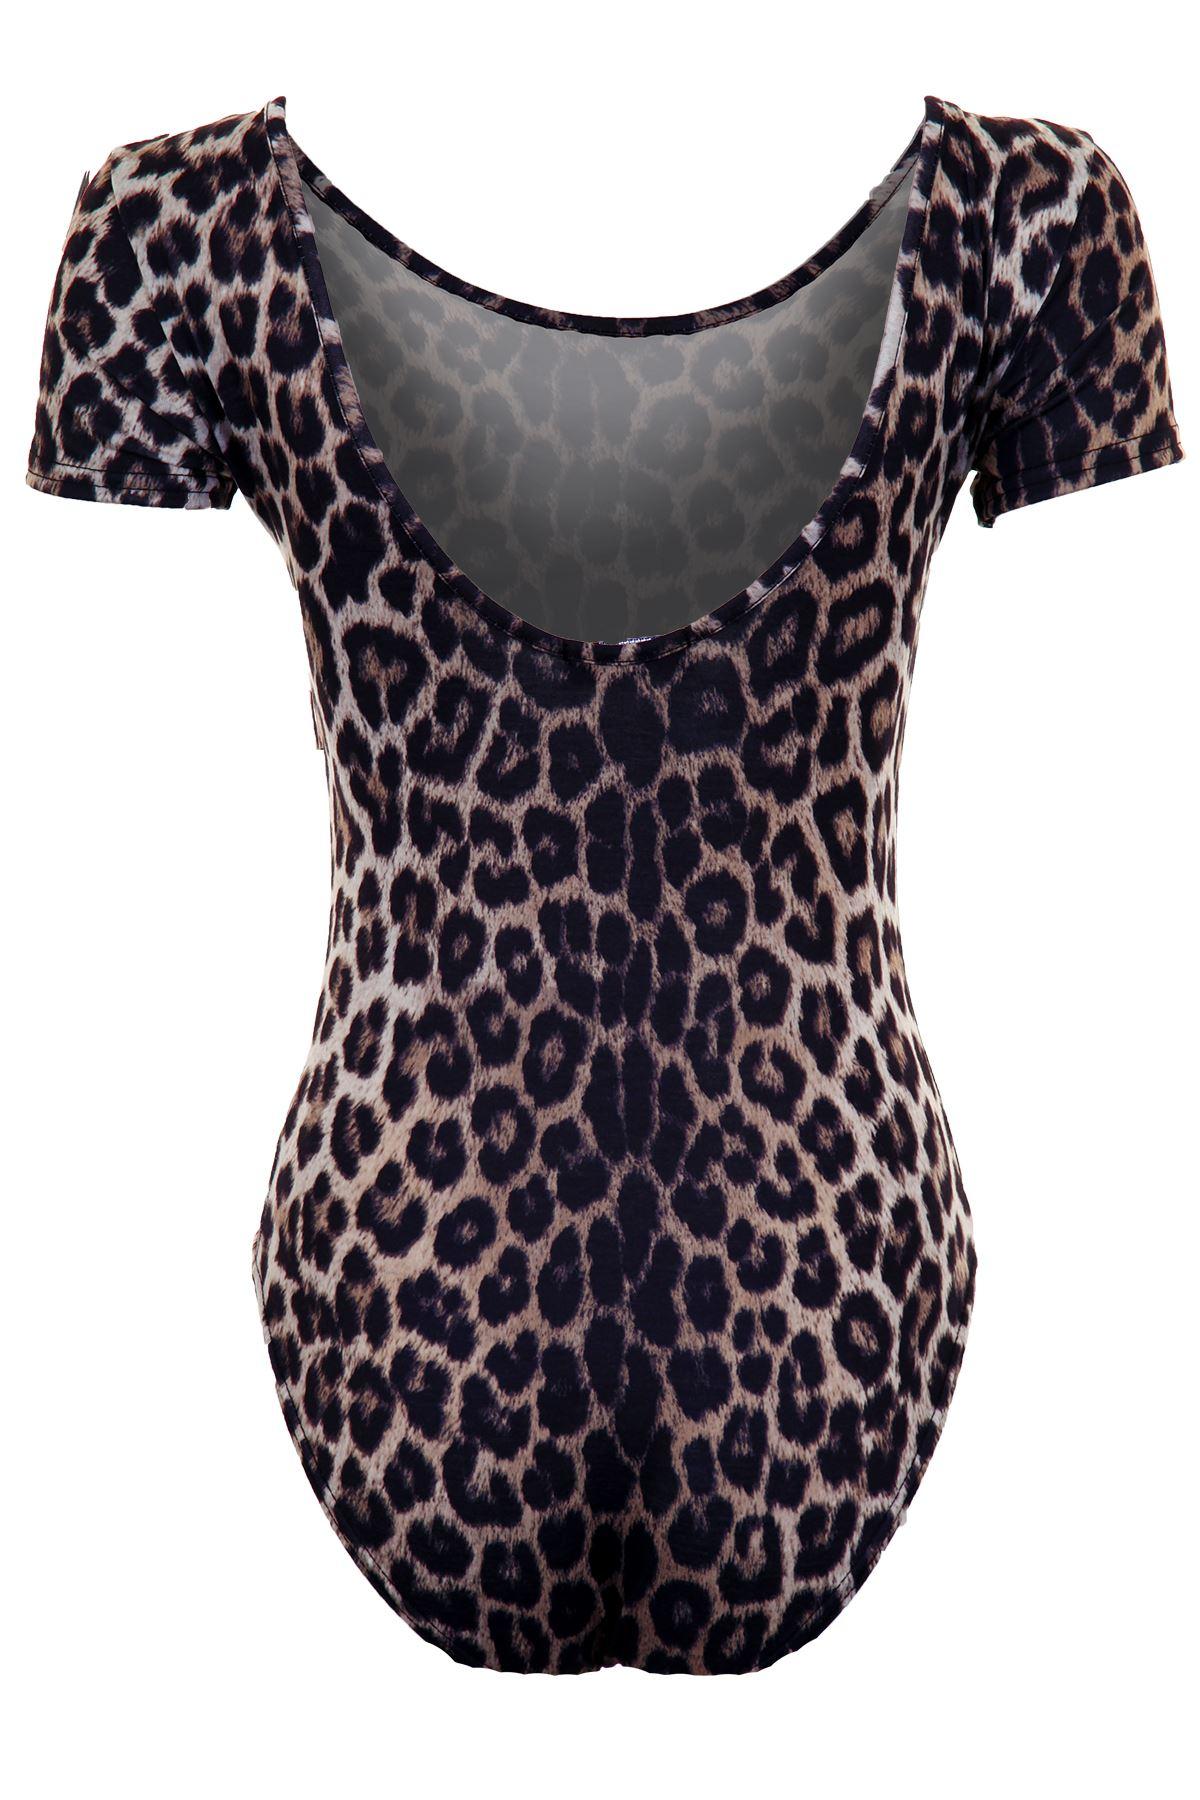 Damen Kurzärmlig einfarbig Tiger Leopard Stretch Damen Turnanzug Body Top